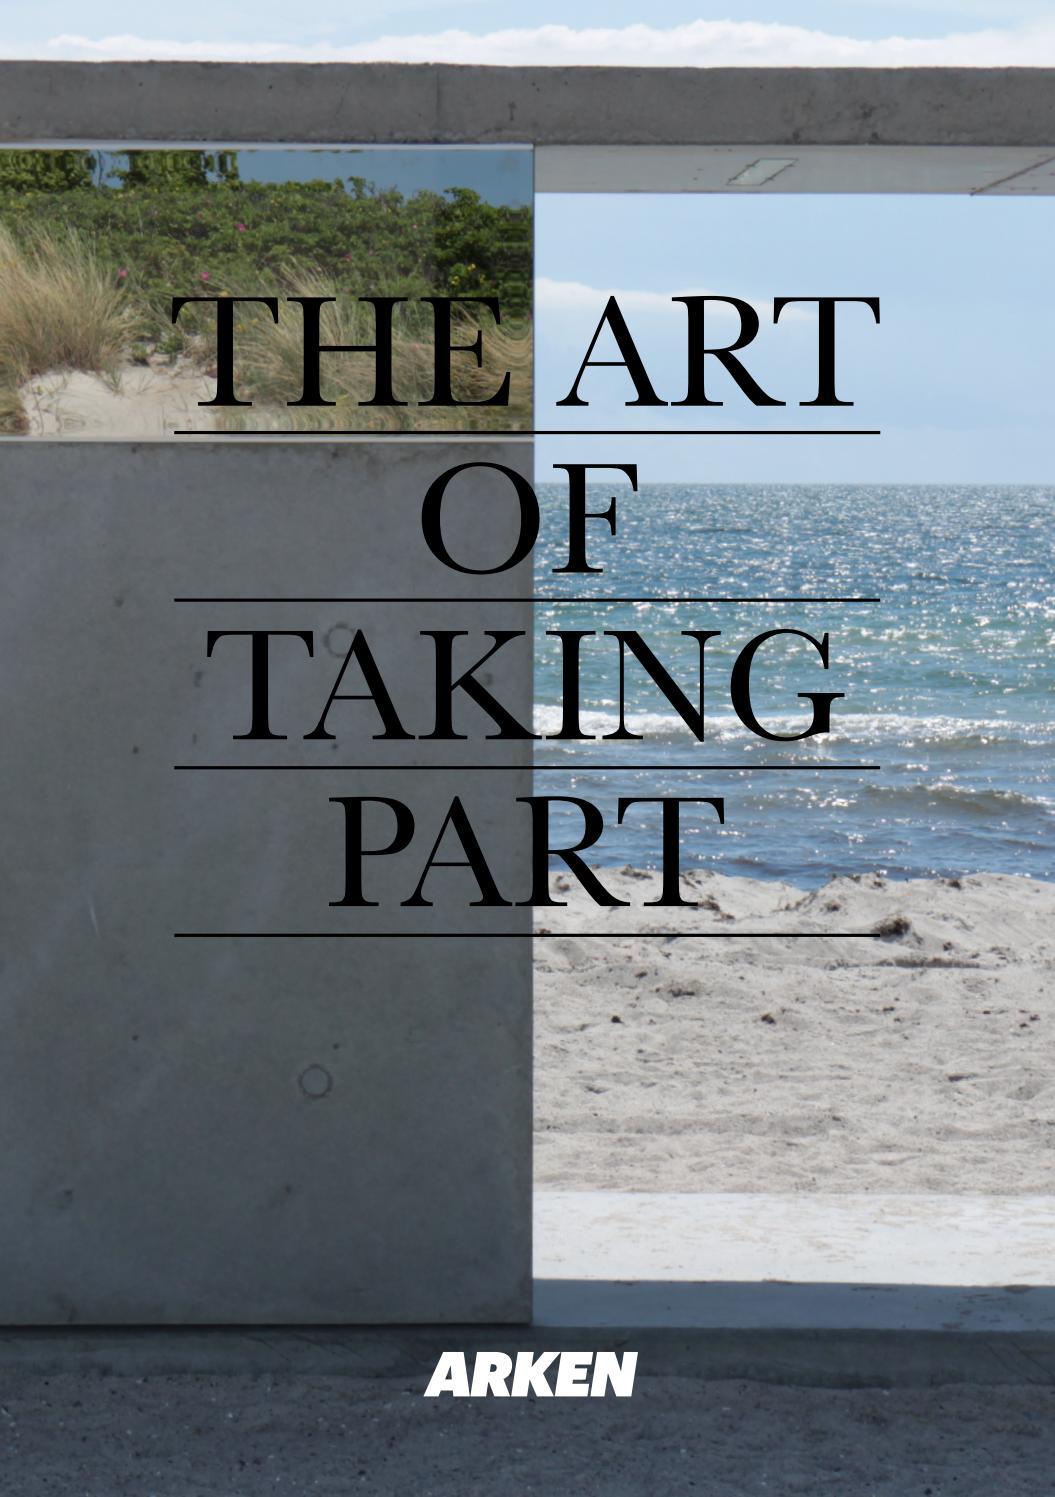 ARKEN BULLETIN, vol. 7: The Art of Taking Part by ARKEN Museum of Modern  Art - issuu